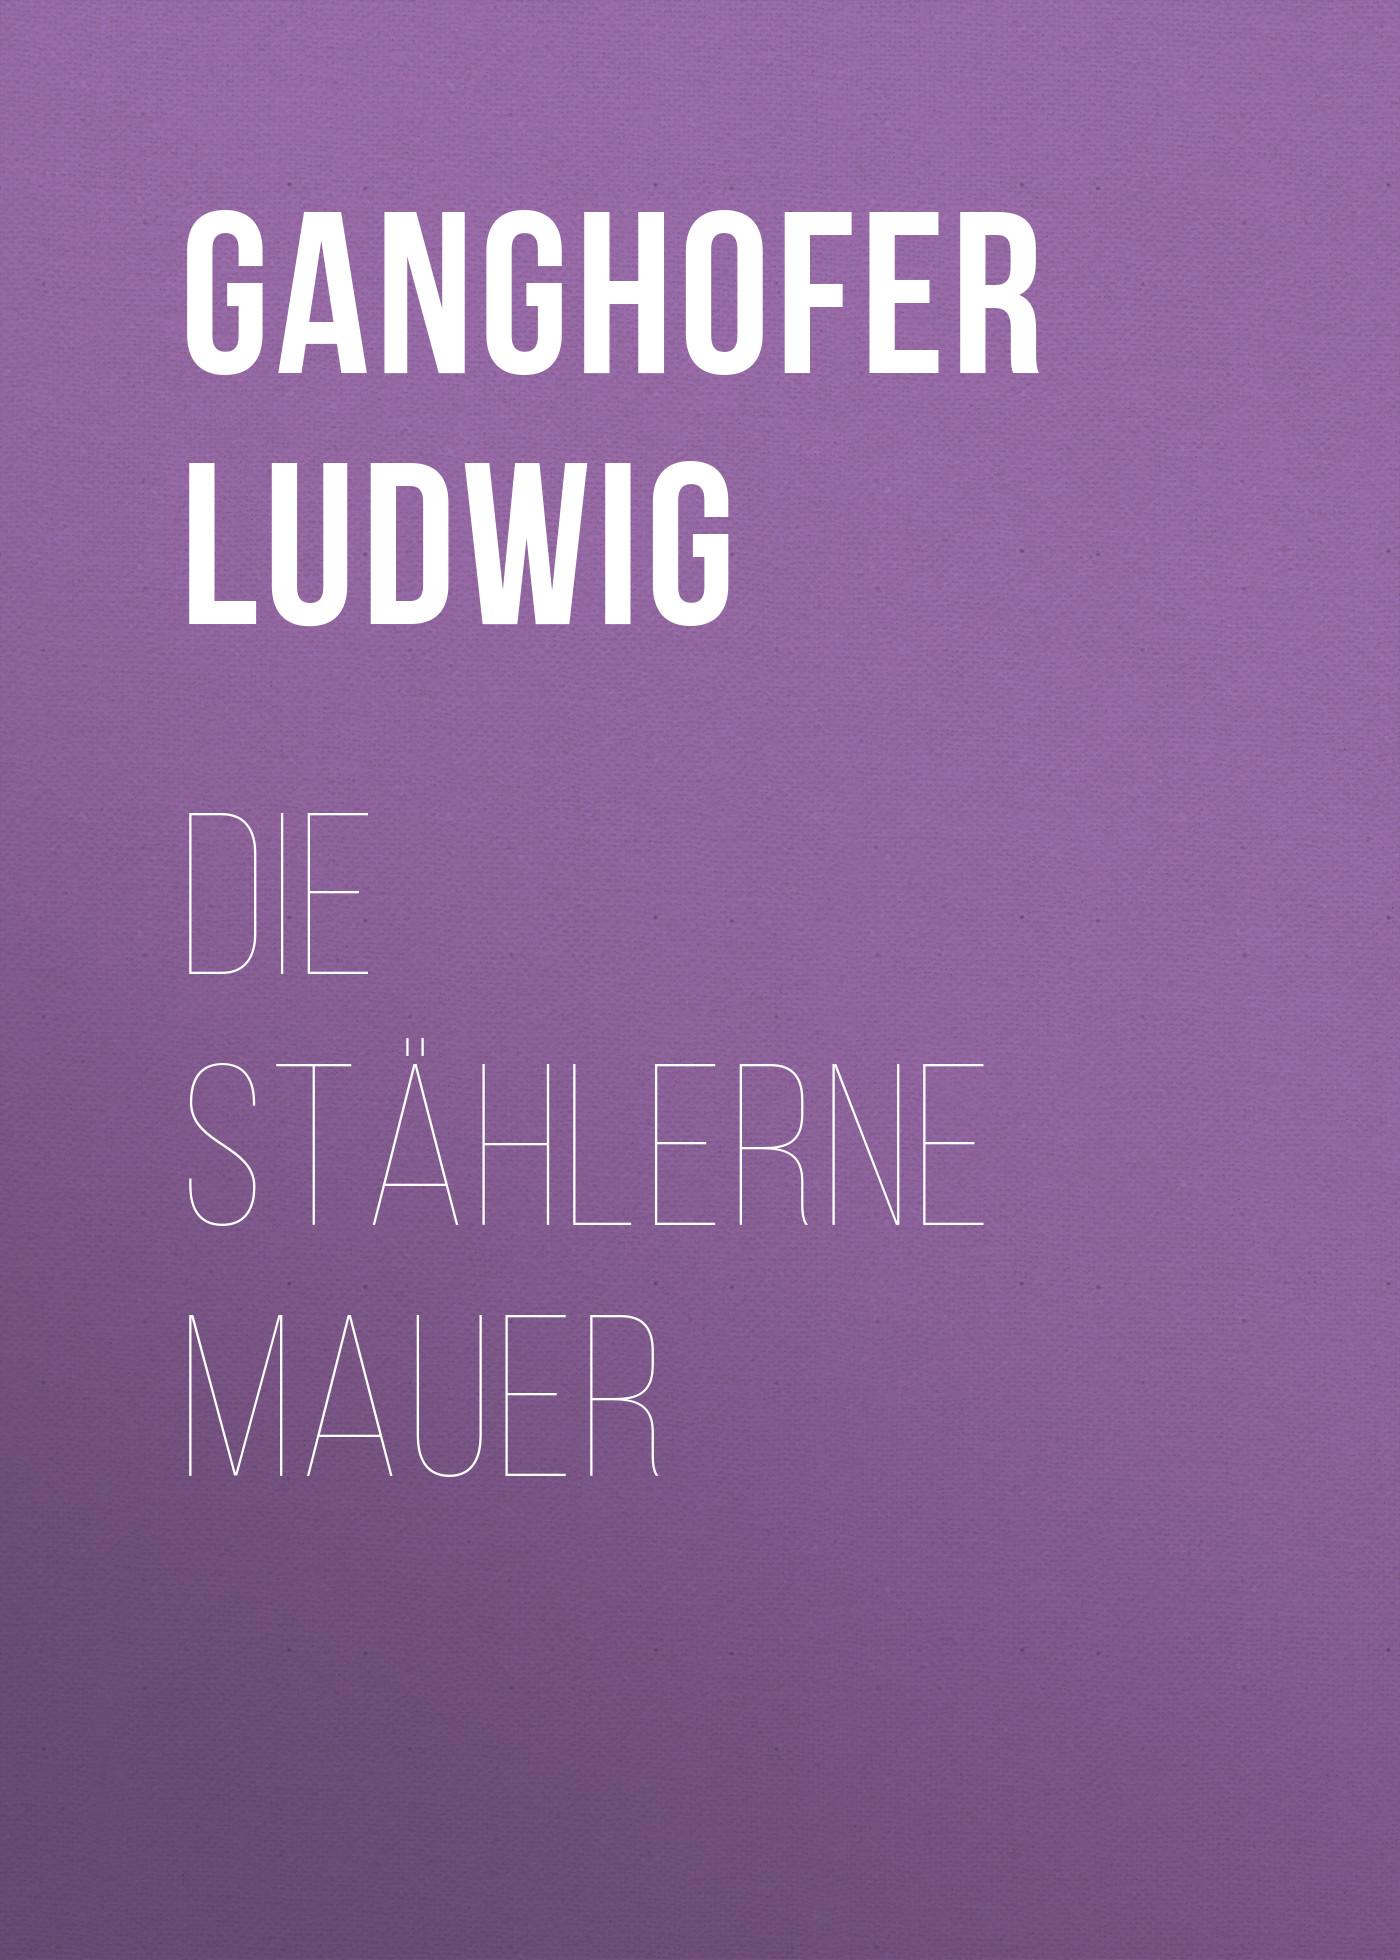 цены Ganghofer Ludwig Die stählerne Mauer